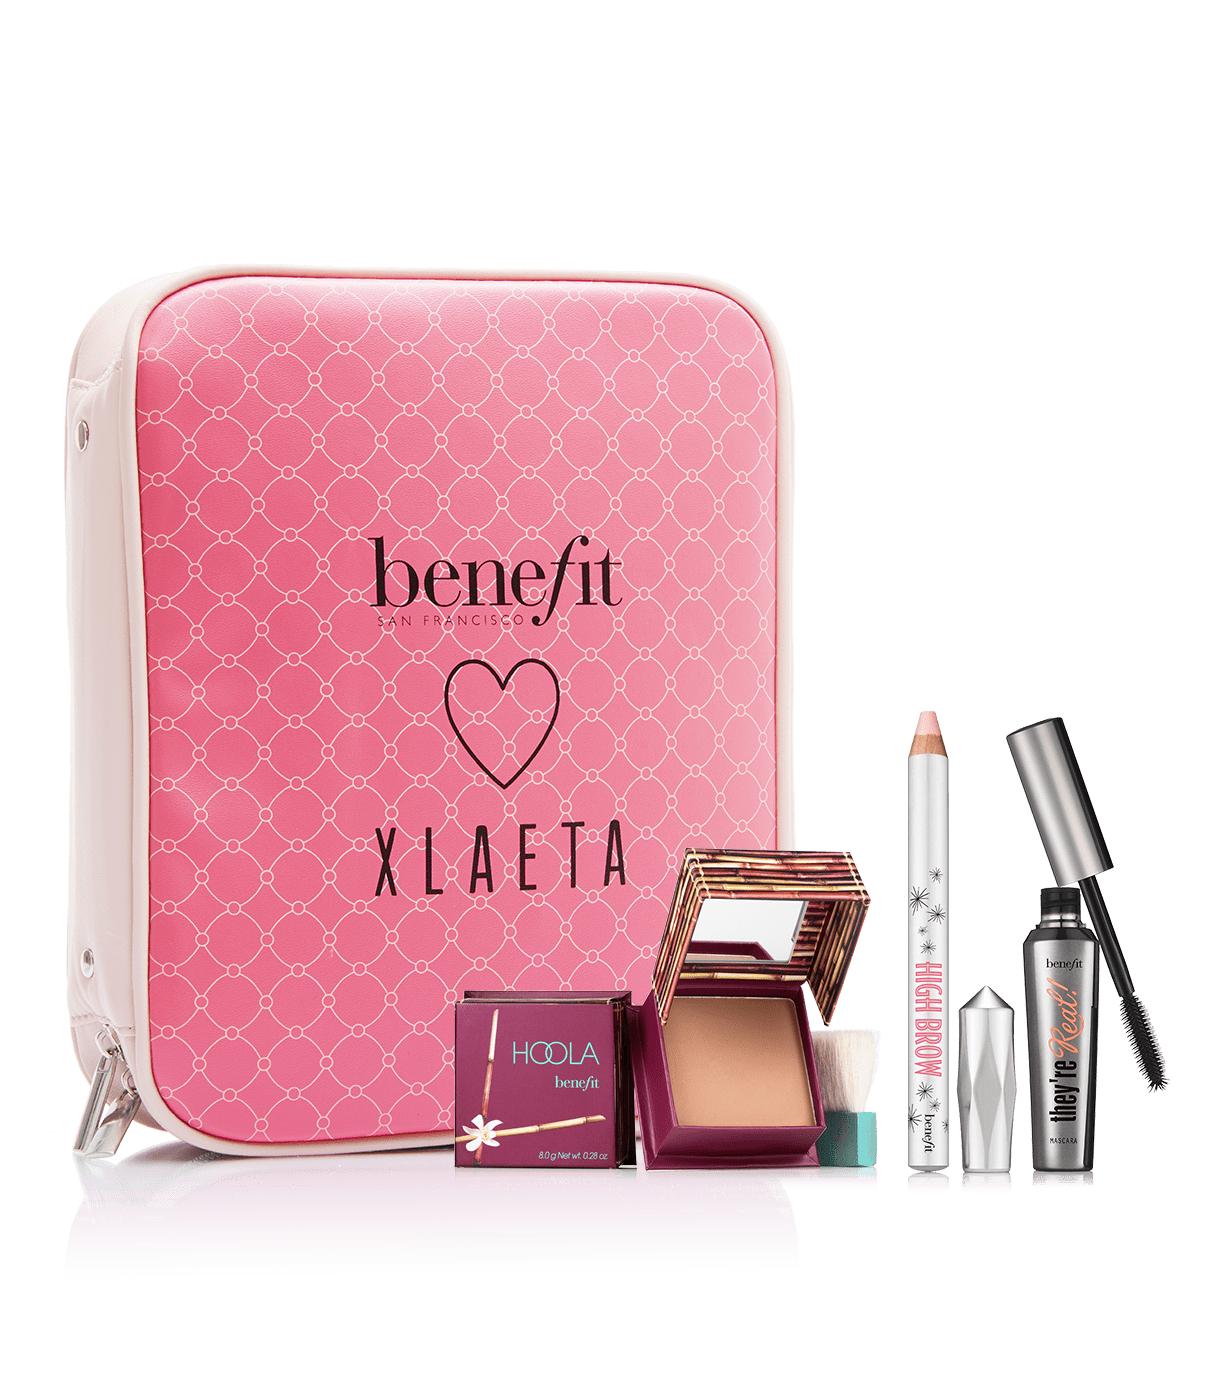 Benefit x Xlaeta beauty bag